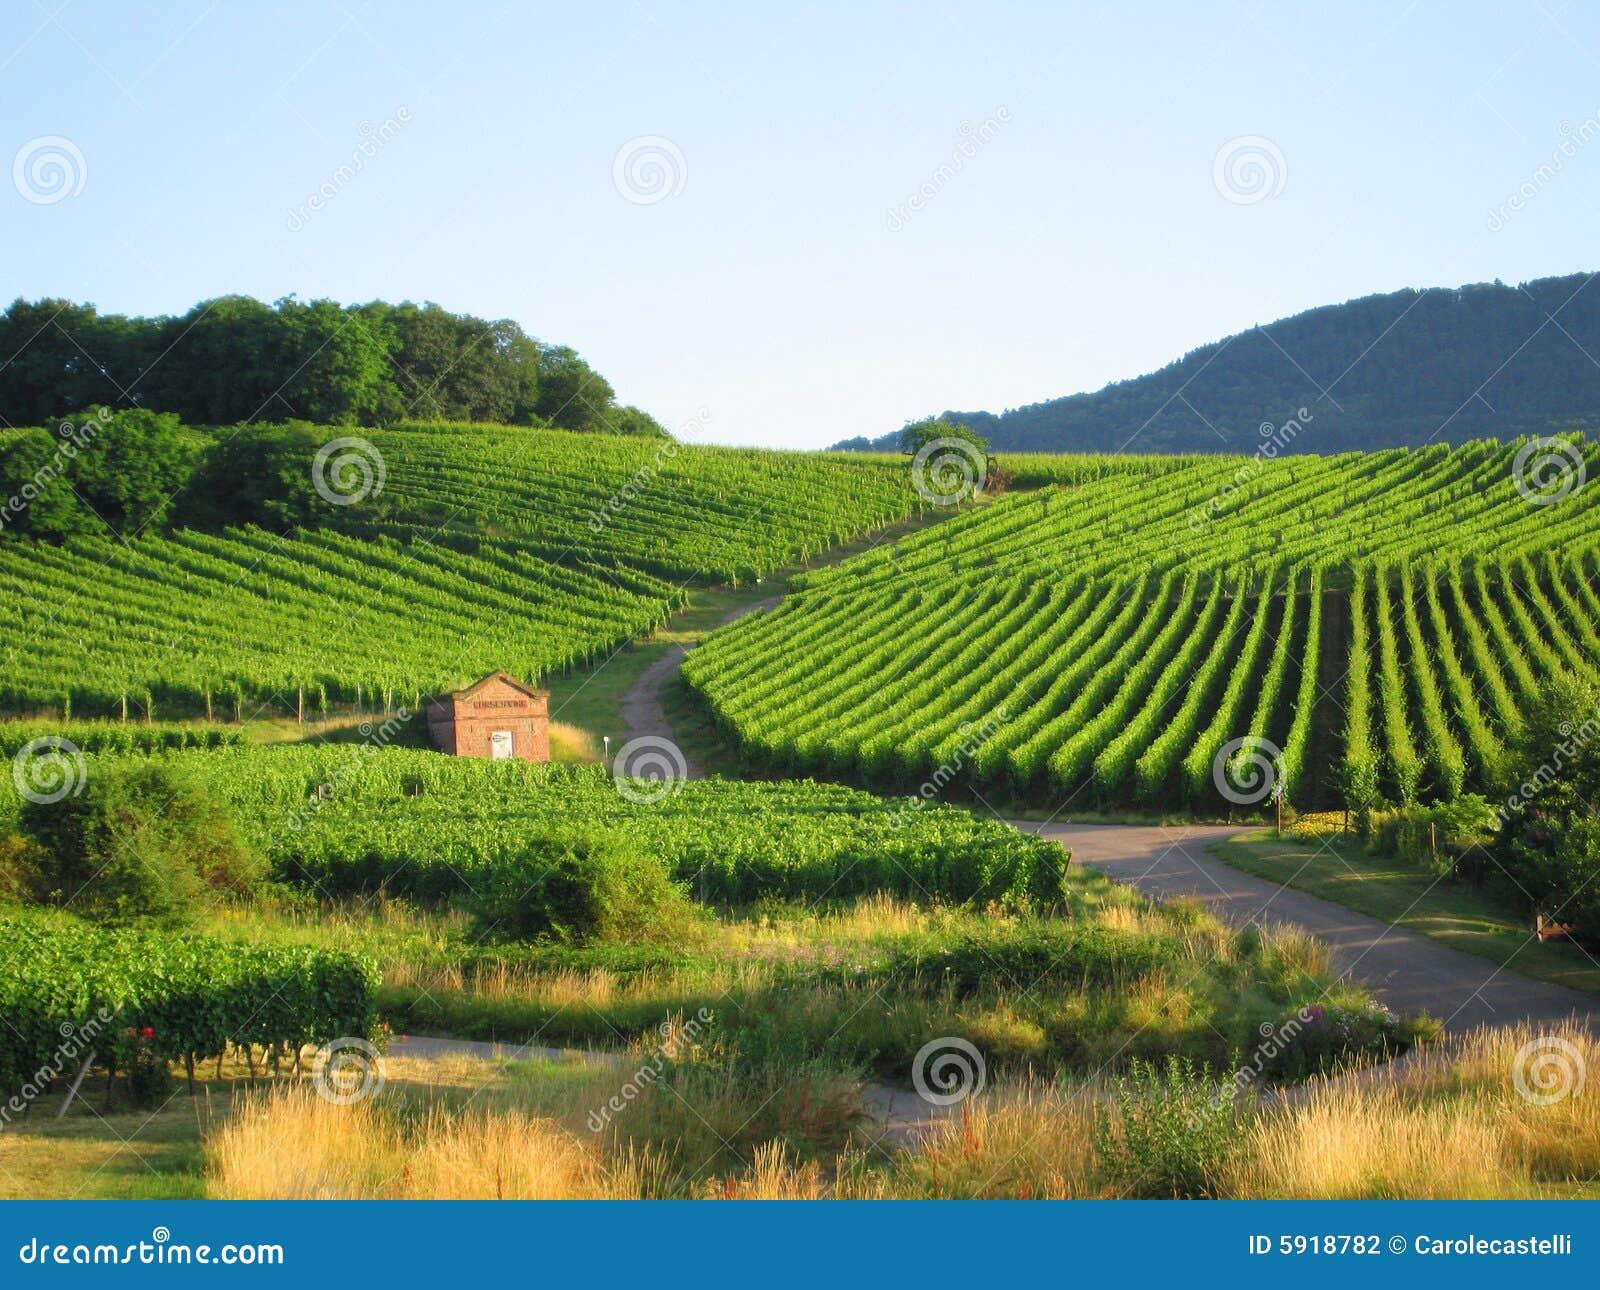 Vineyard in Alsace